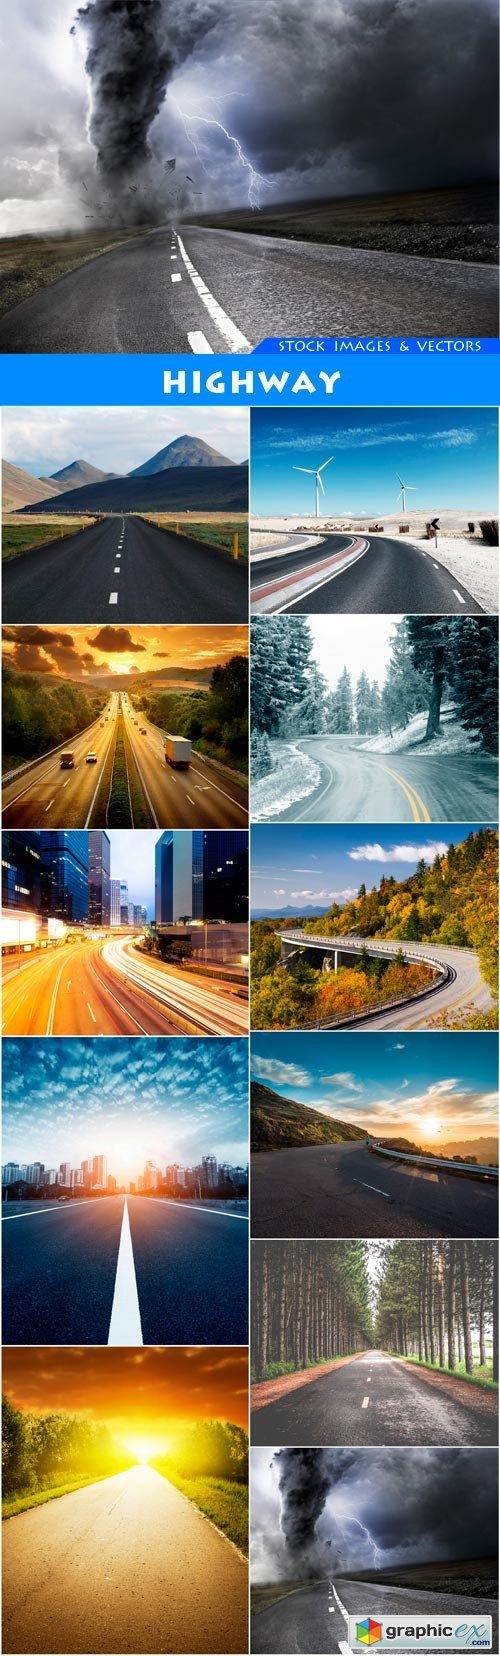 Highway 11X JPEG